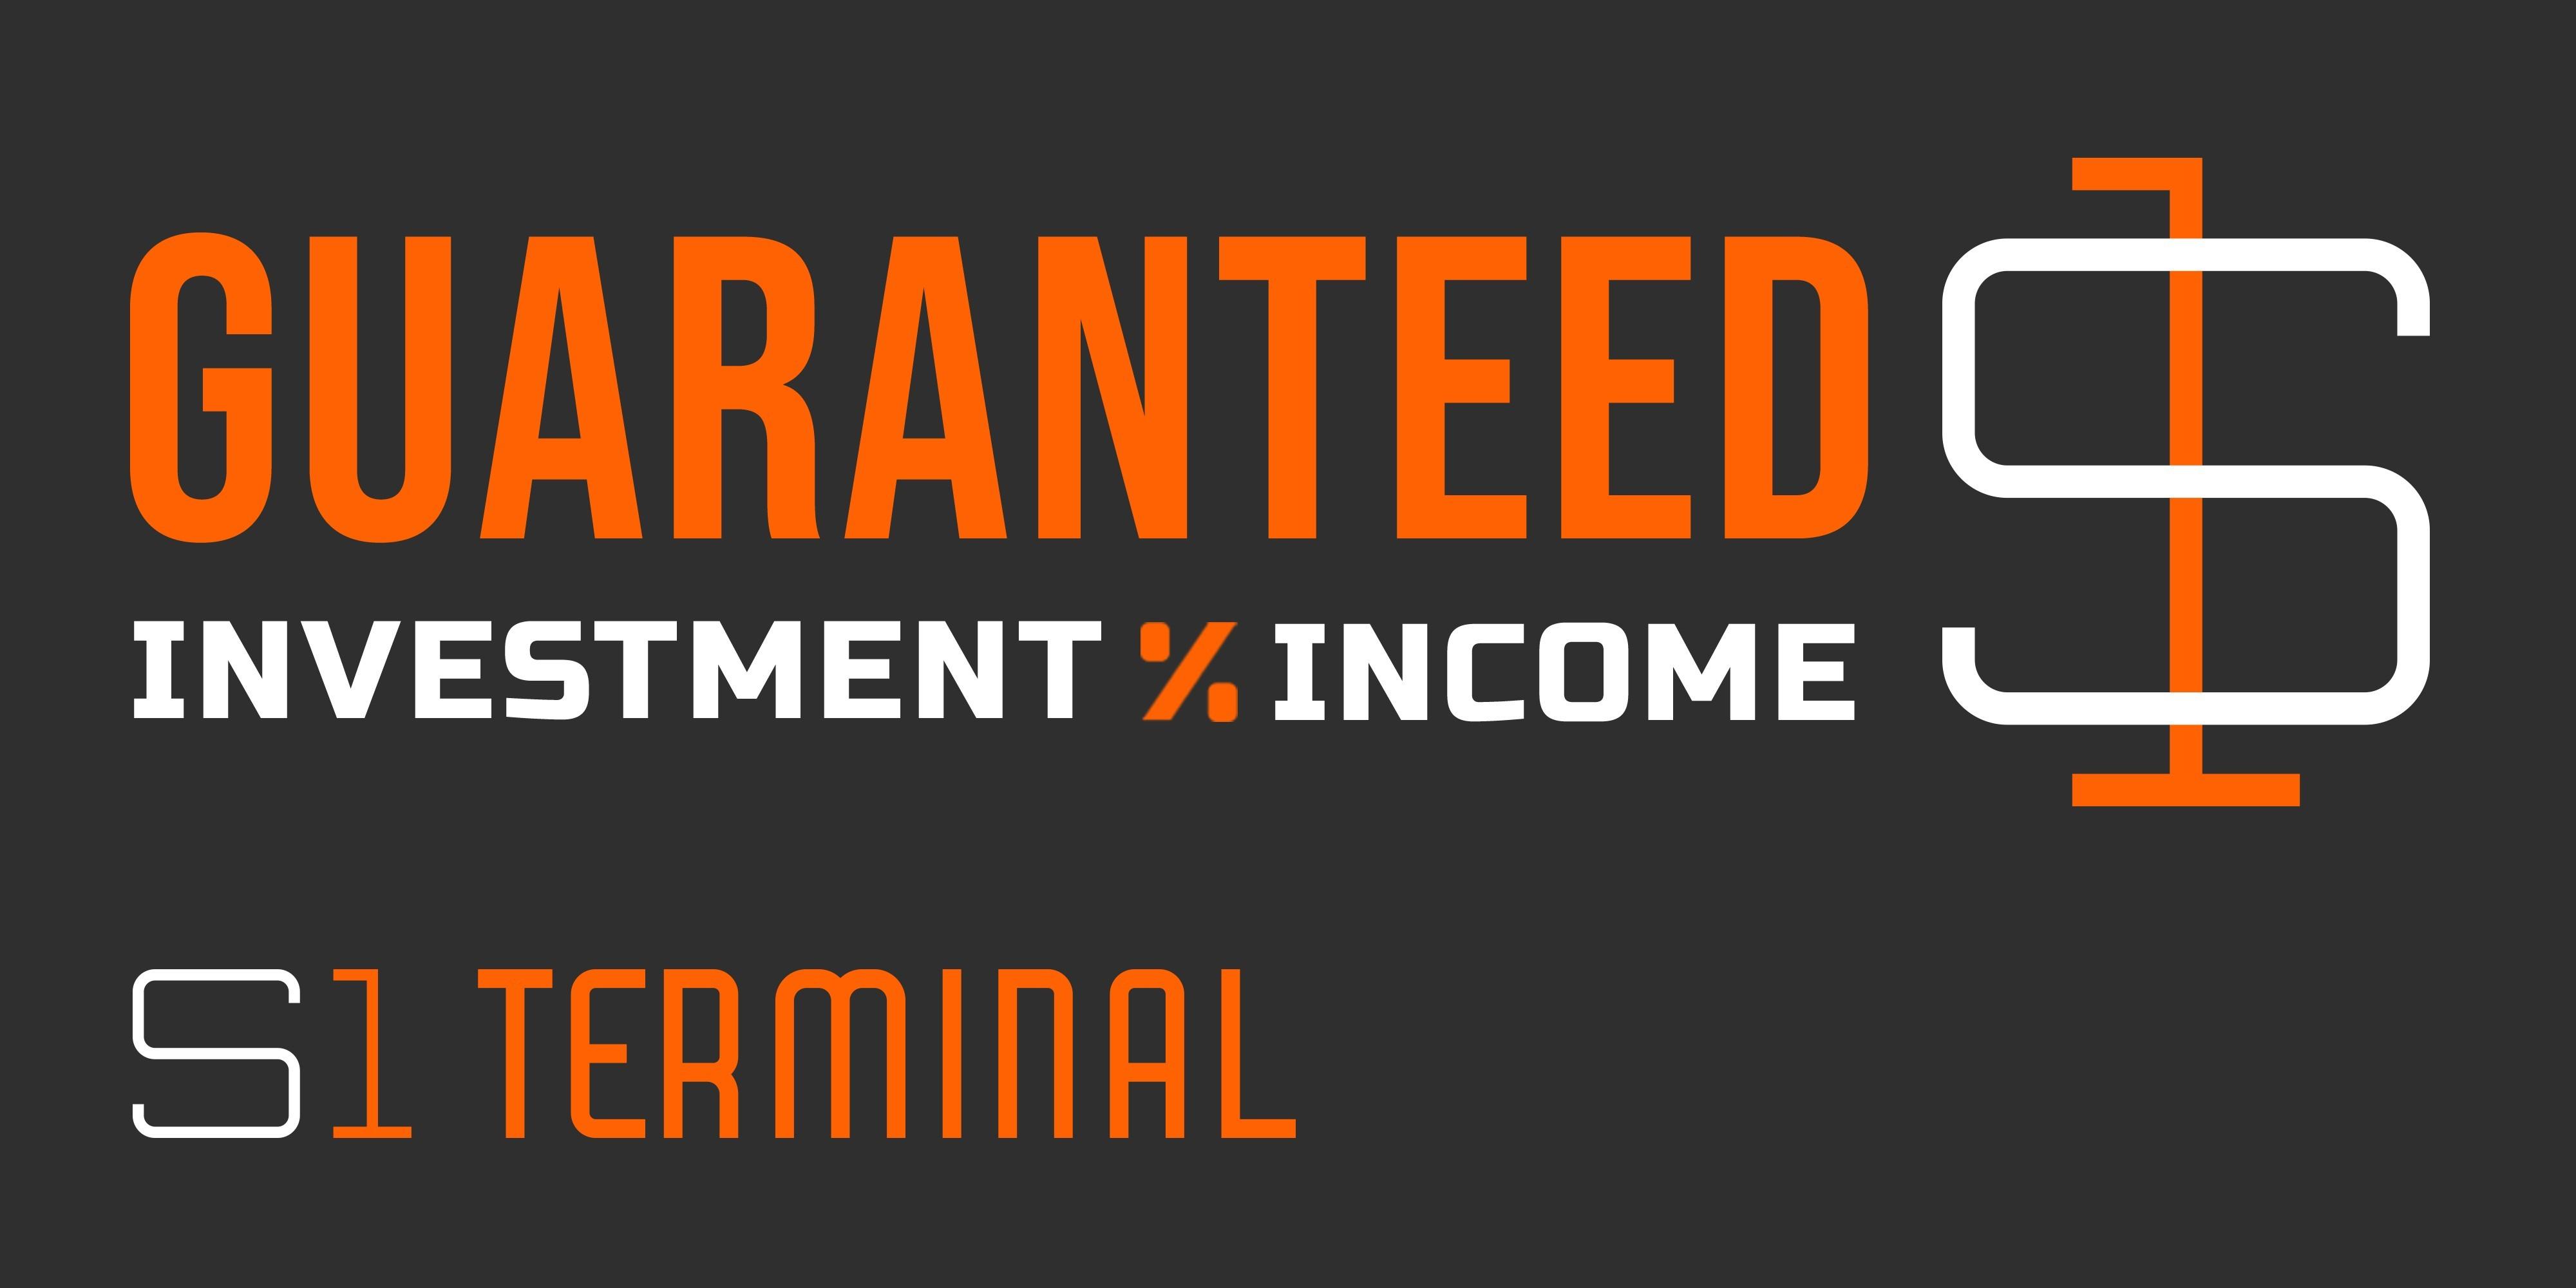 Guaranteed income 5.5%